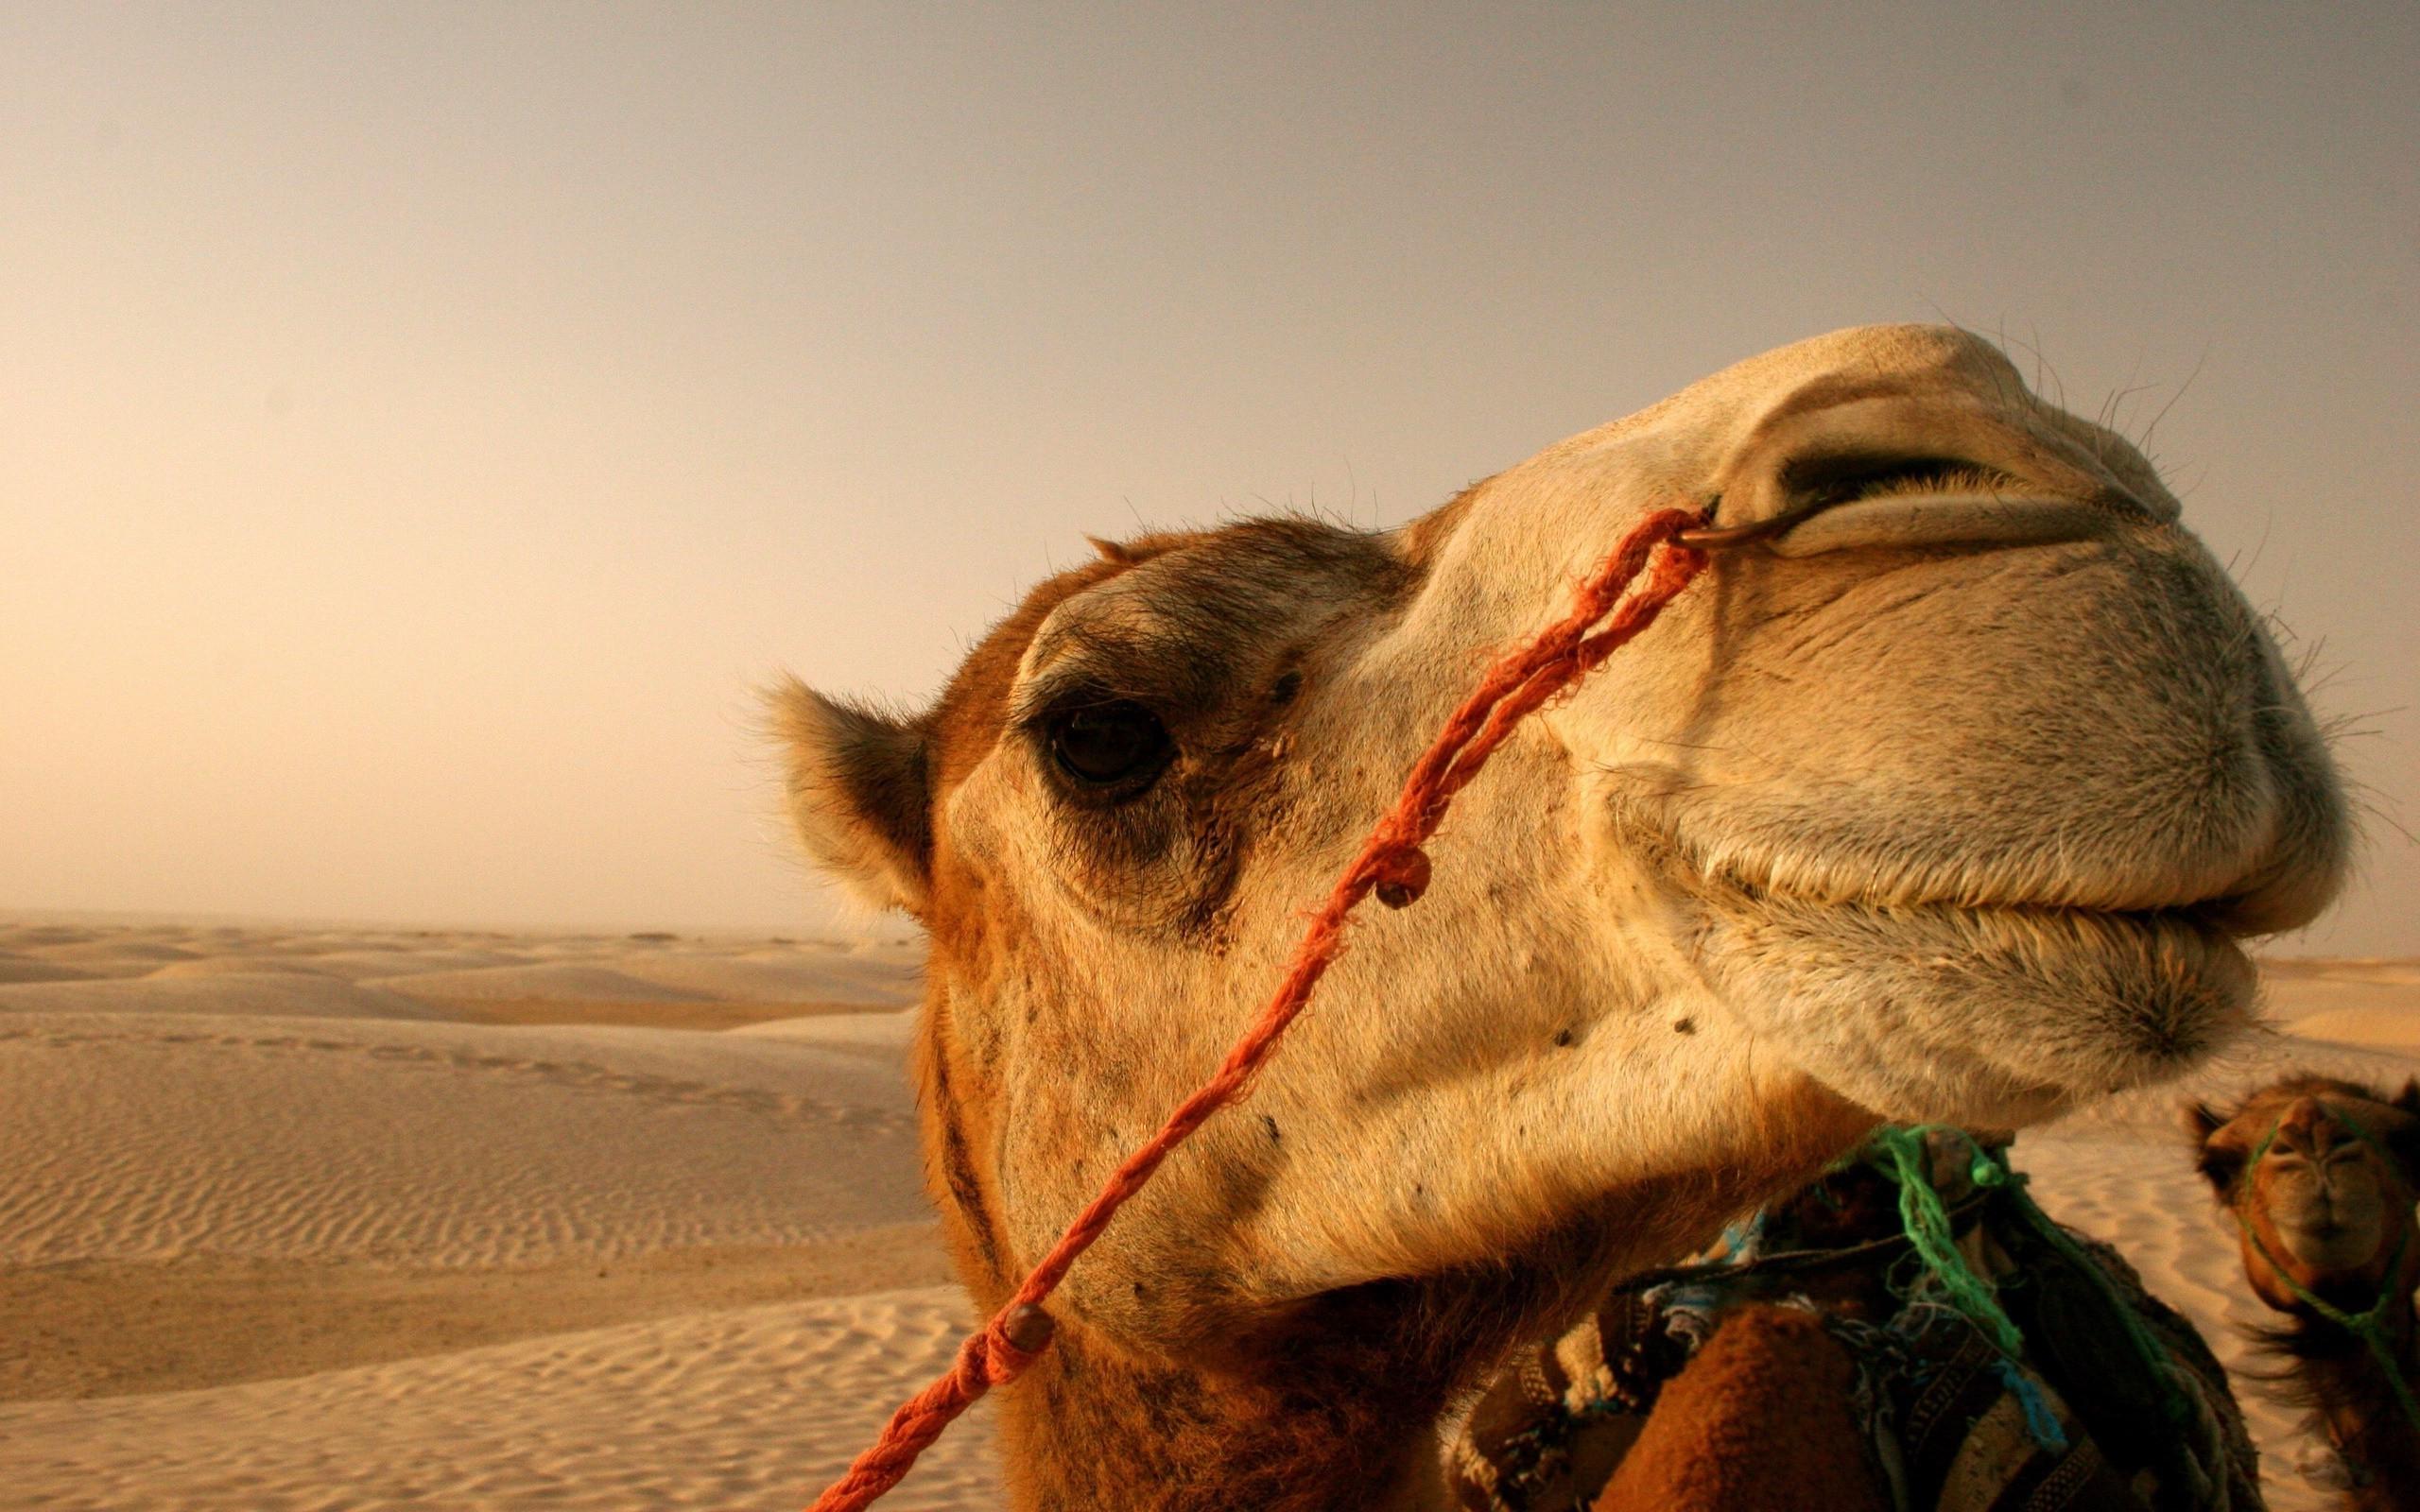 Wallpaper Landscape Animals Desert Camels Sahara